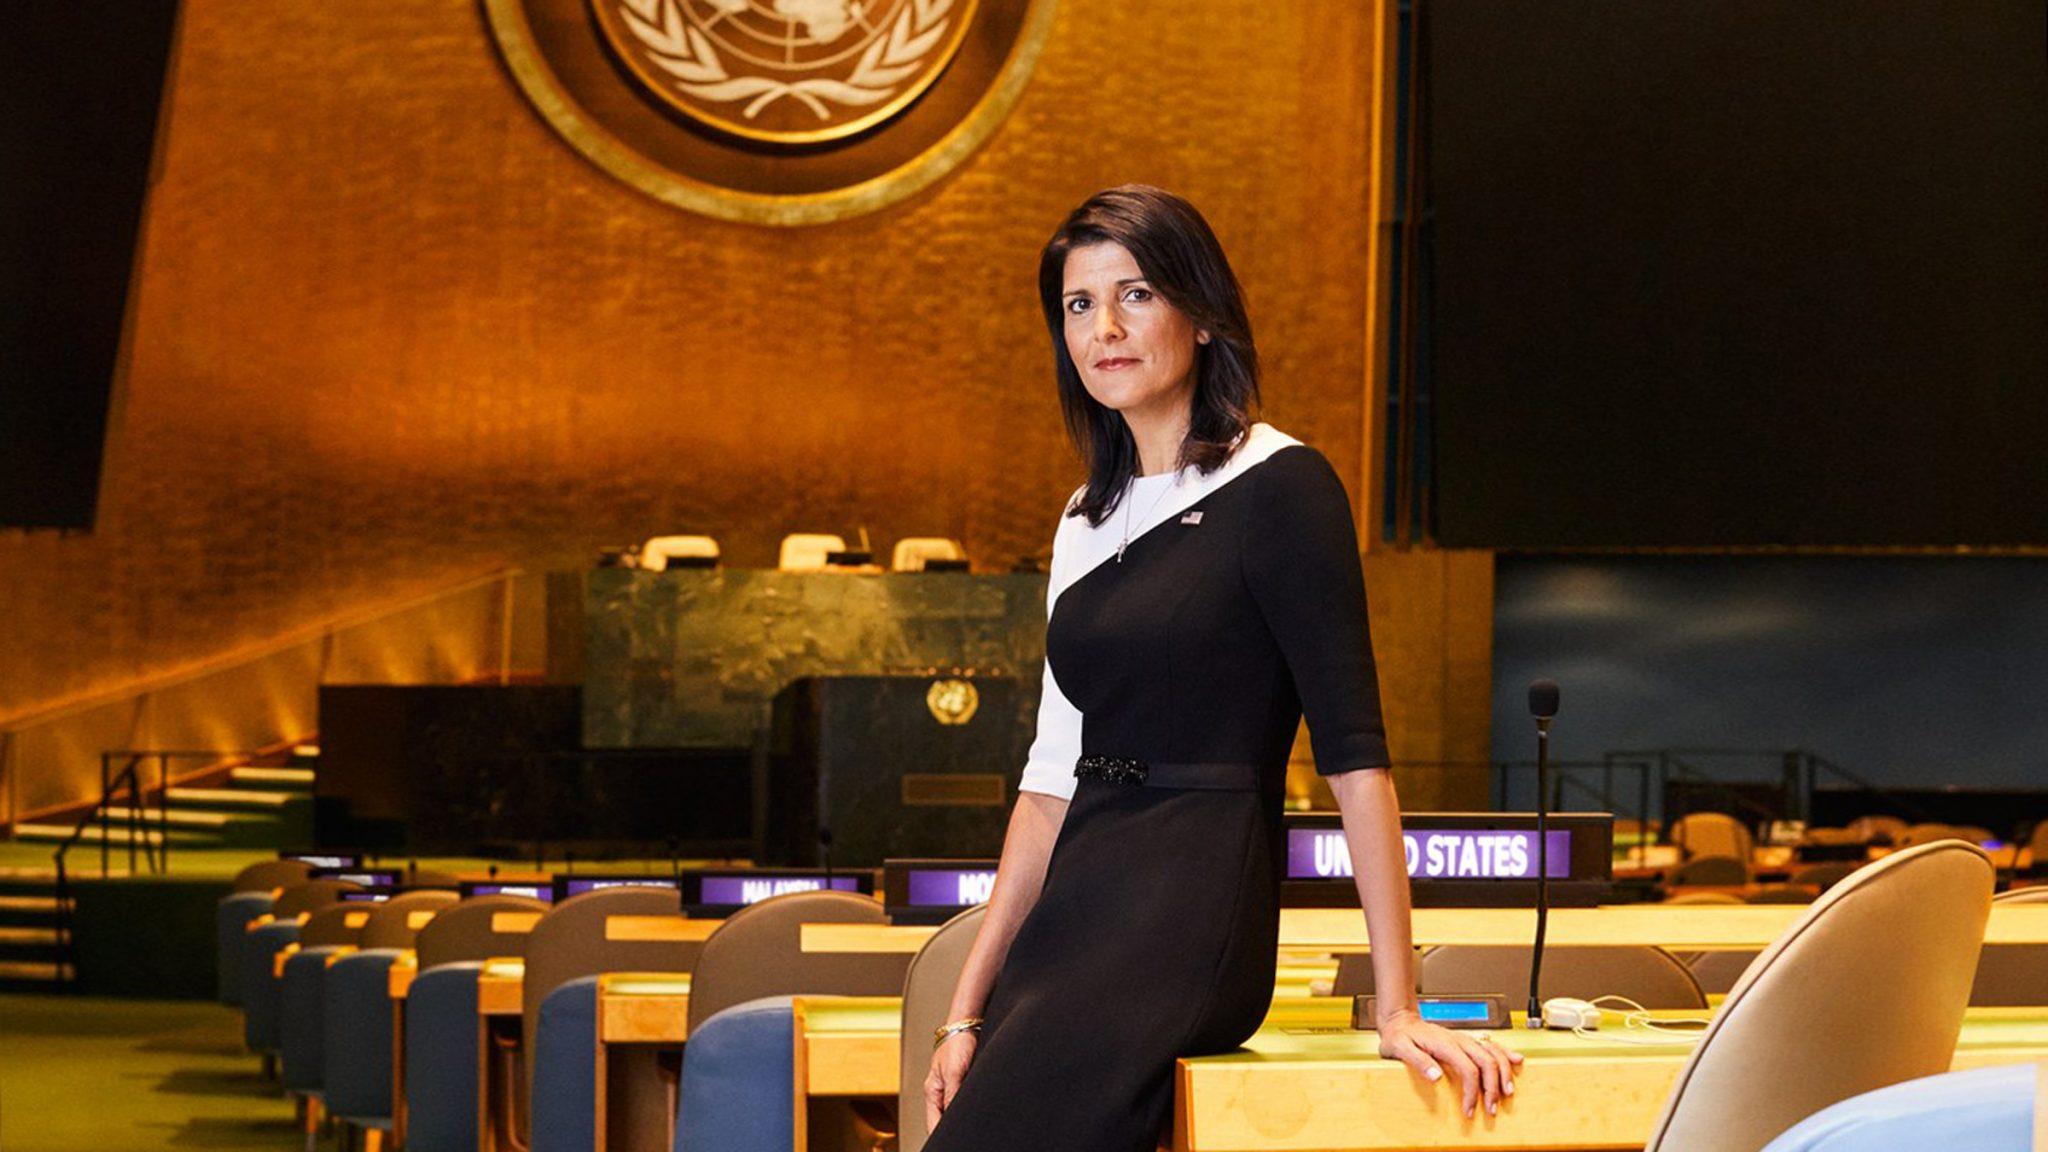 UN anti-Israel bias confronted by Envoy Nikki Haley